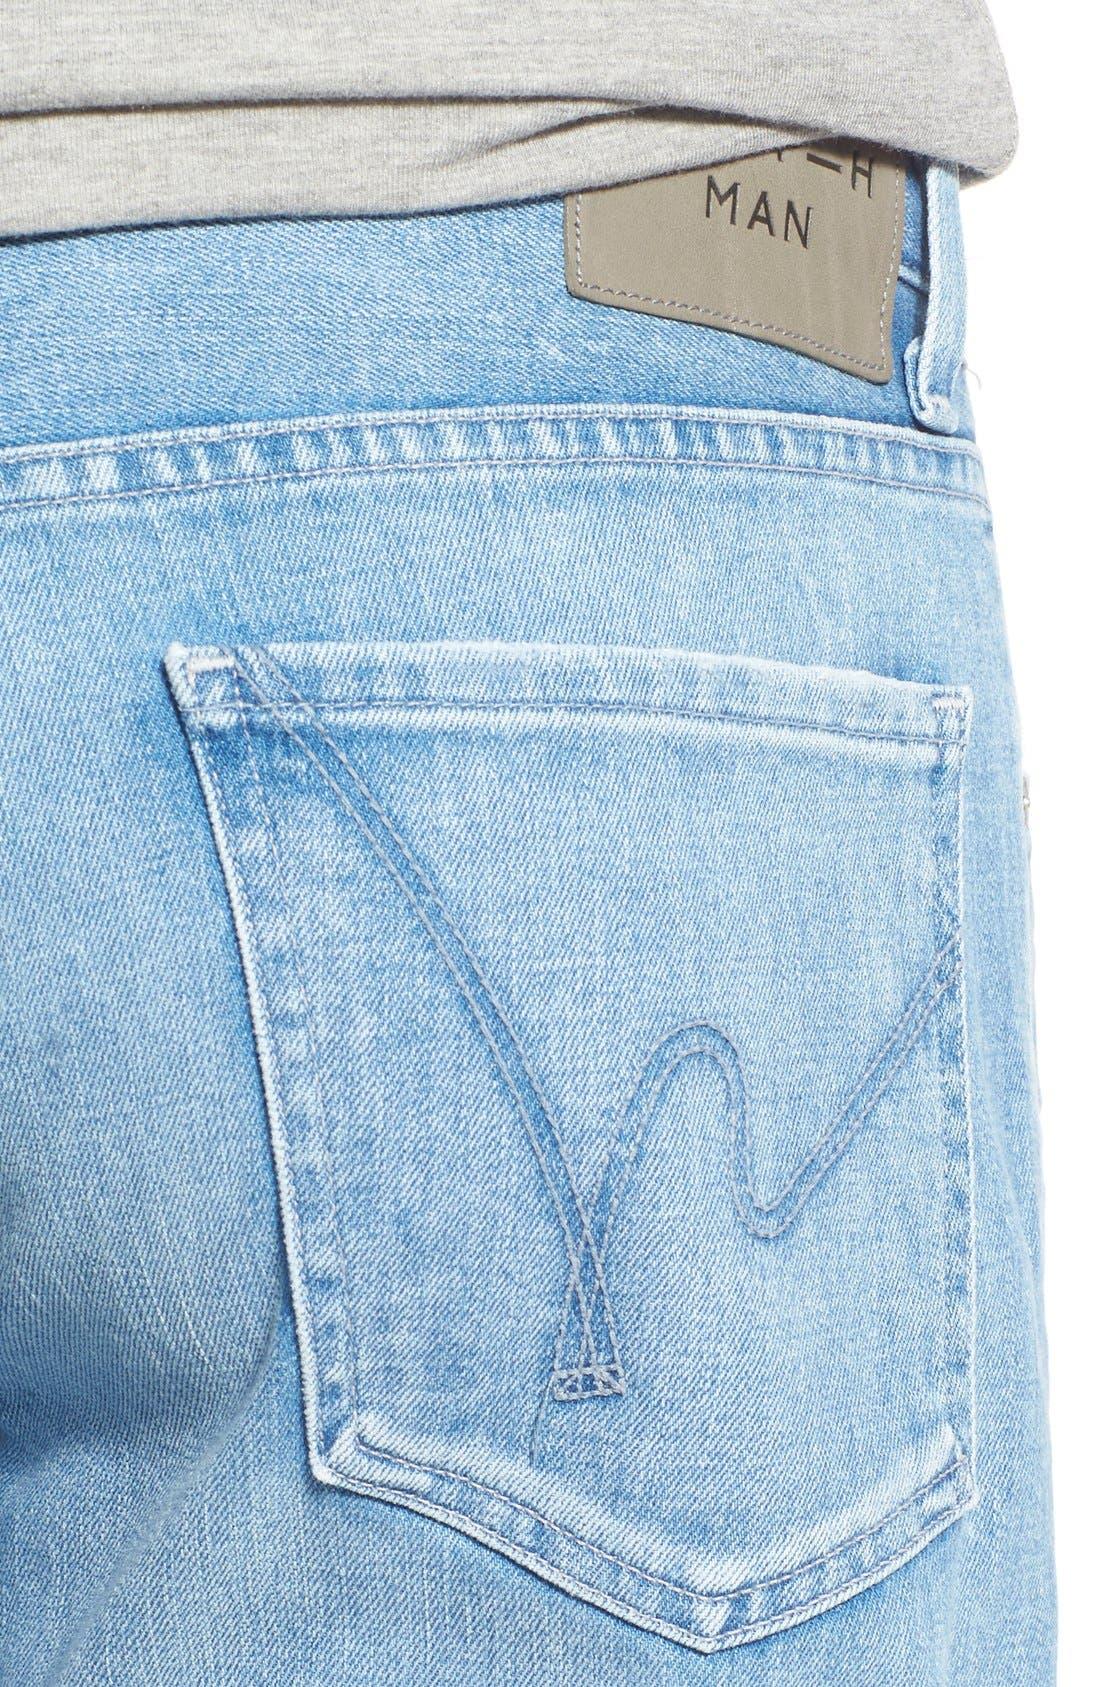 'Sid' Straight Leg Jeans,                             Alternate thumbnail 5, color,                             465